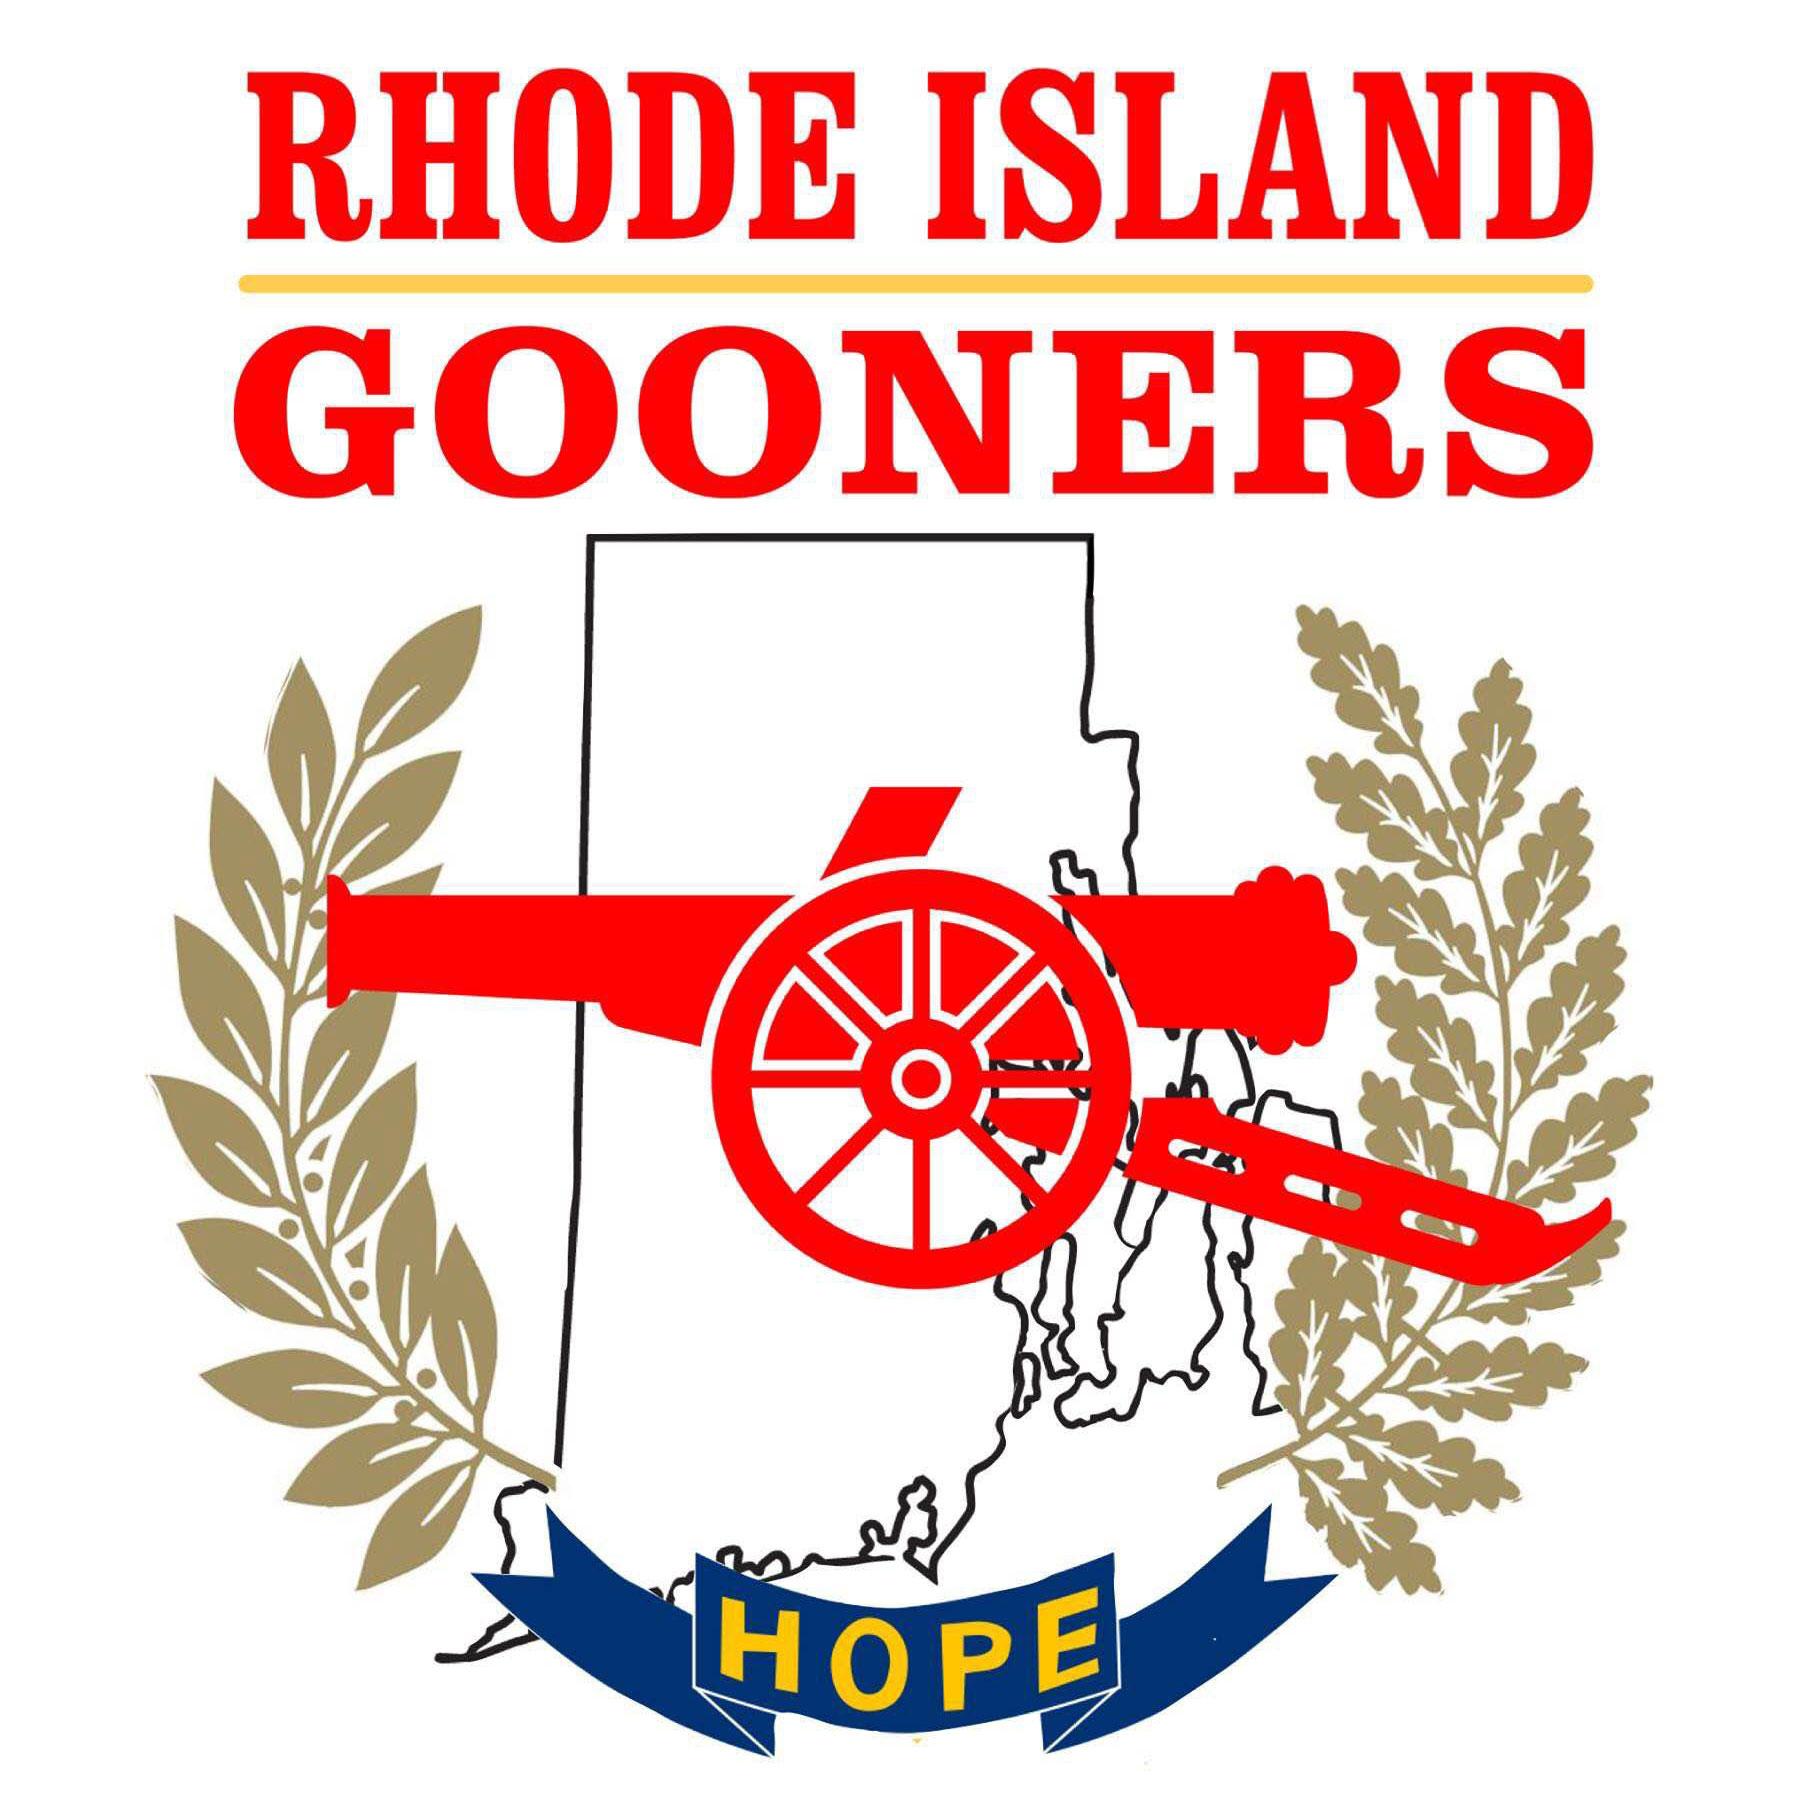 Rhode Island Gooners